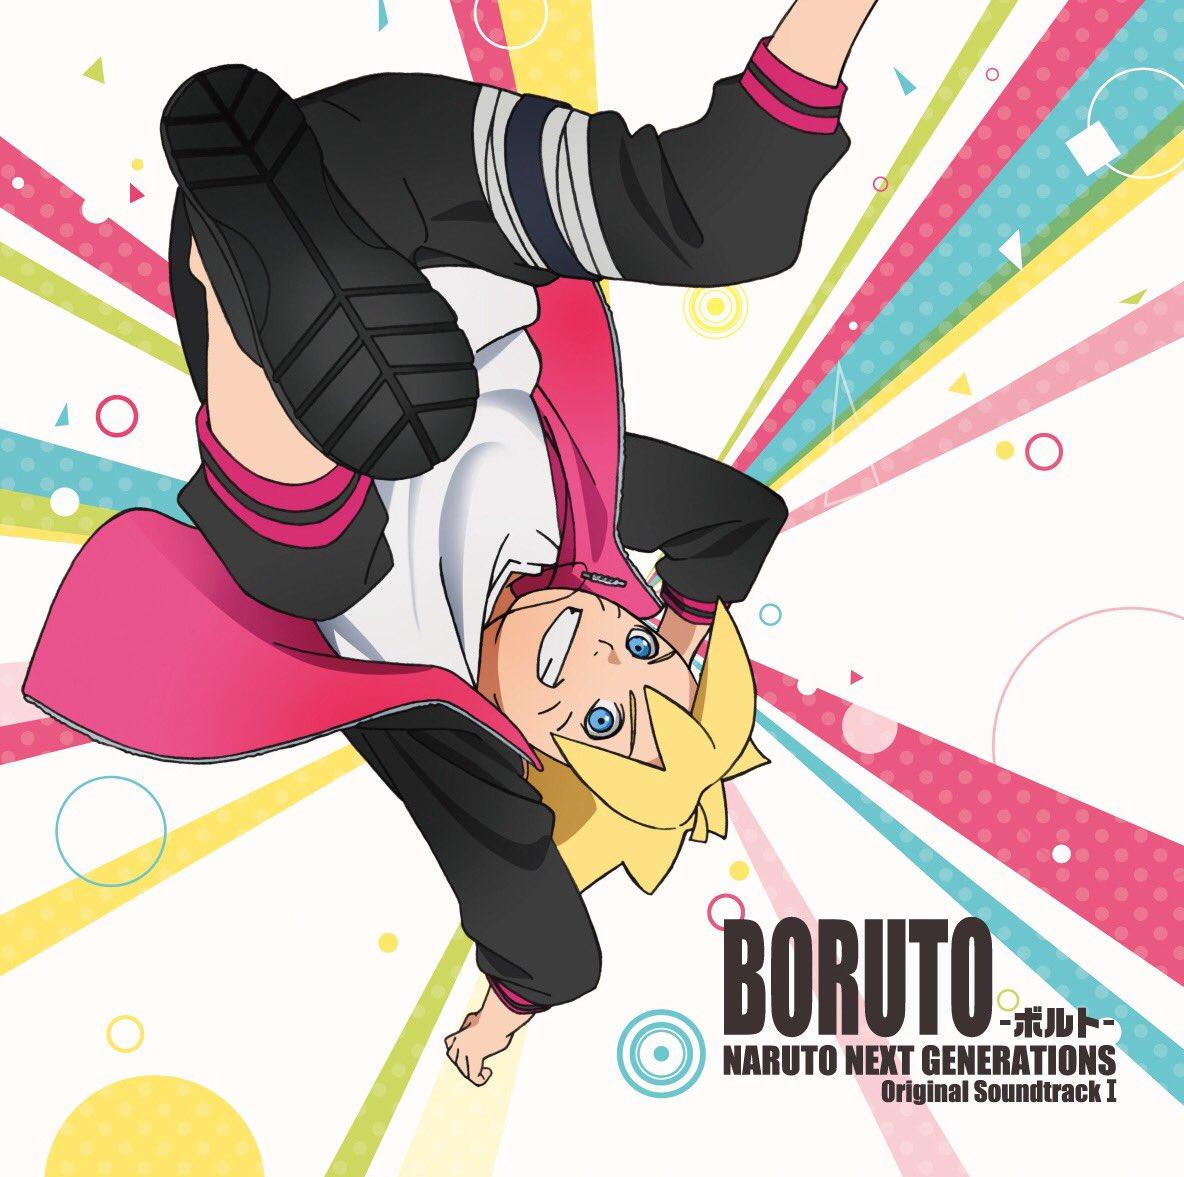 Cover Boruto Next Generations Soundtrack 1 by AiKawaiiChan